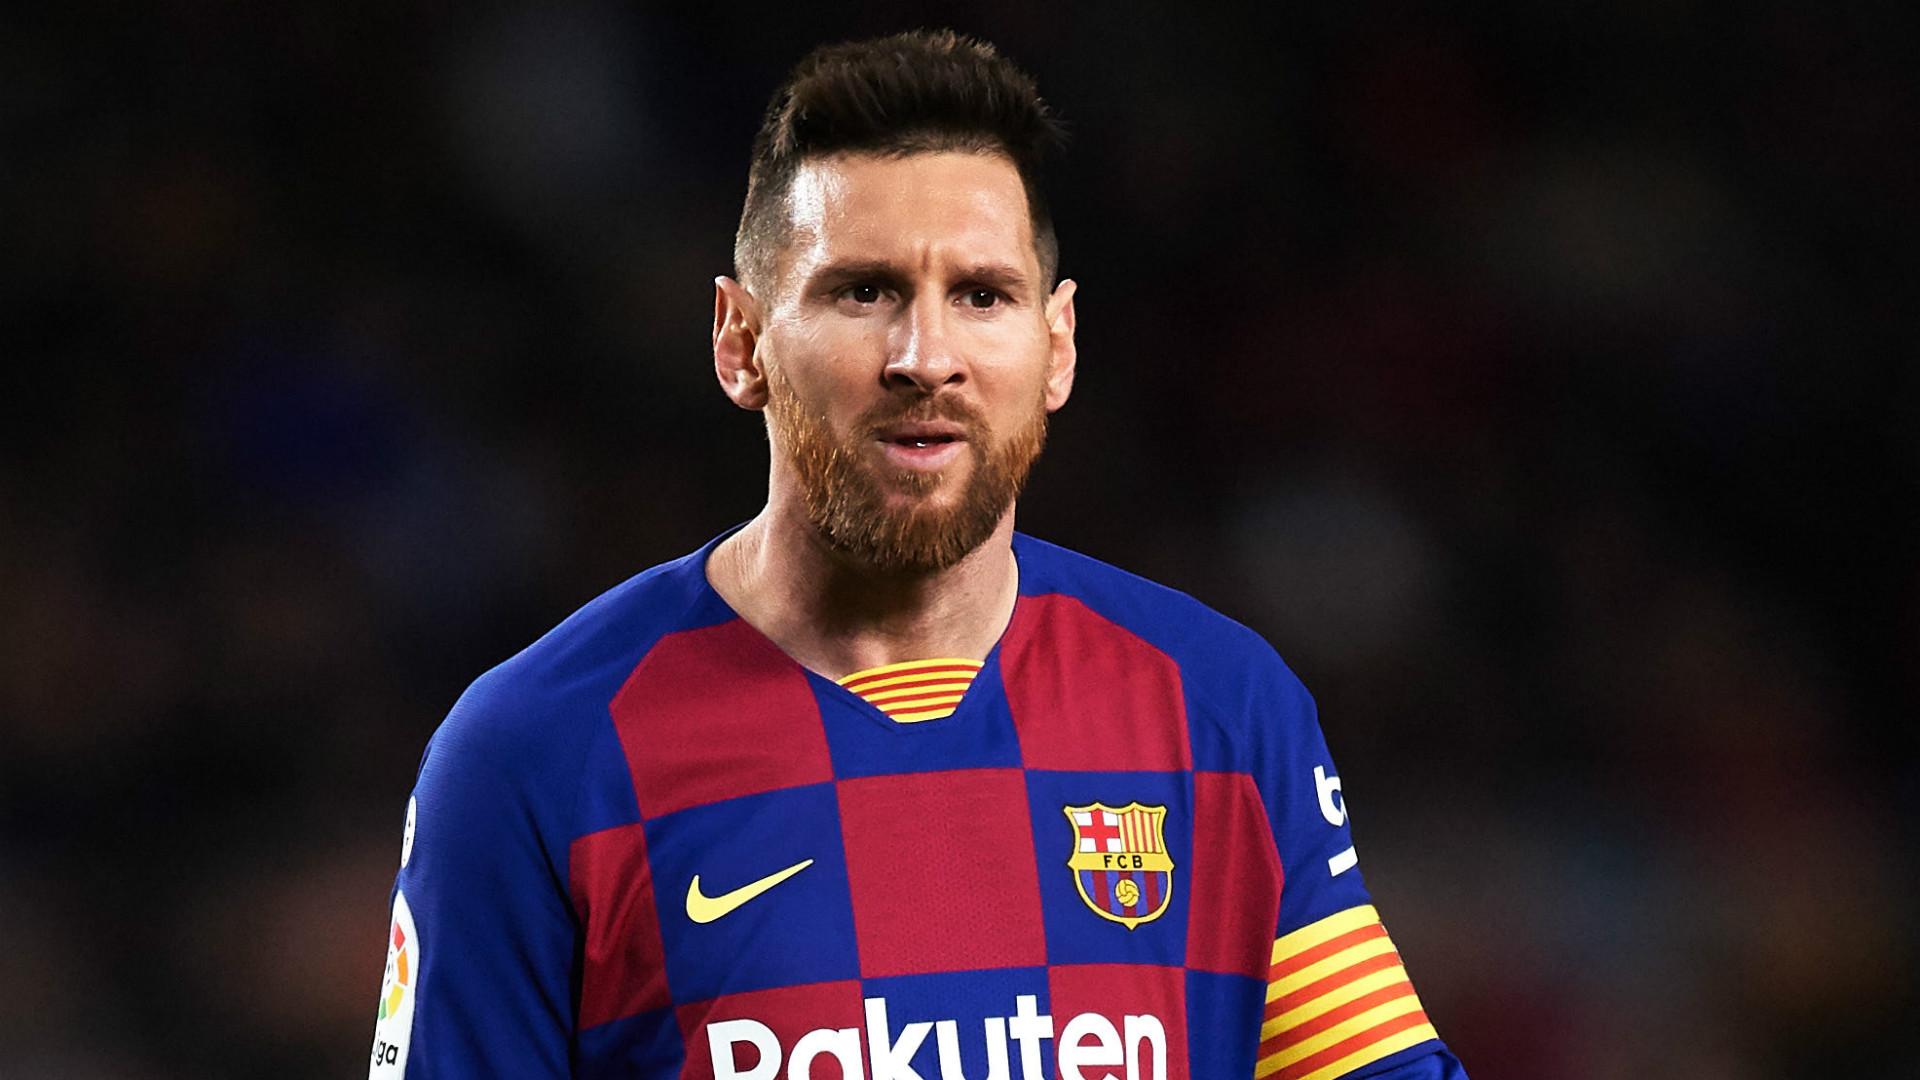 LIVE: Barcelona vs Mallorca